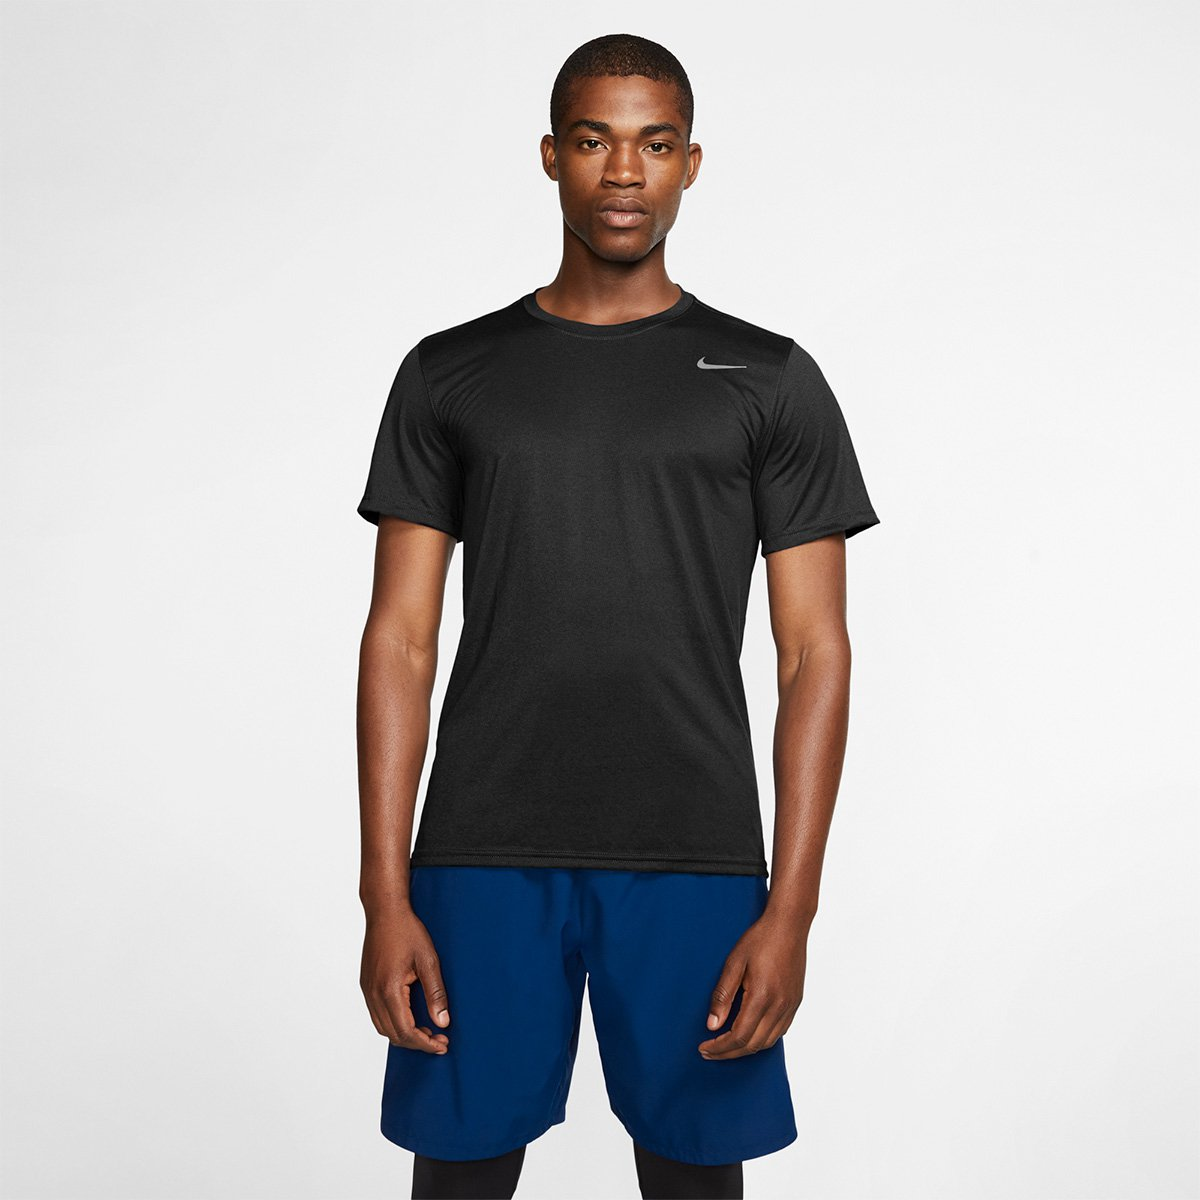 Camiseta Nike Legend 2.0 Ss Masculina - Tam: GG